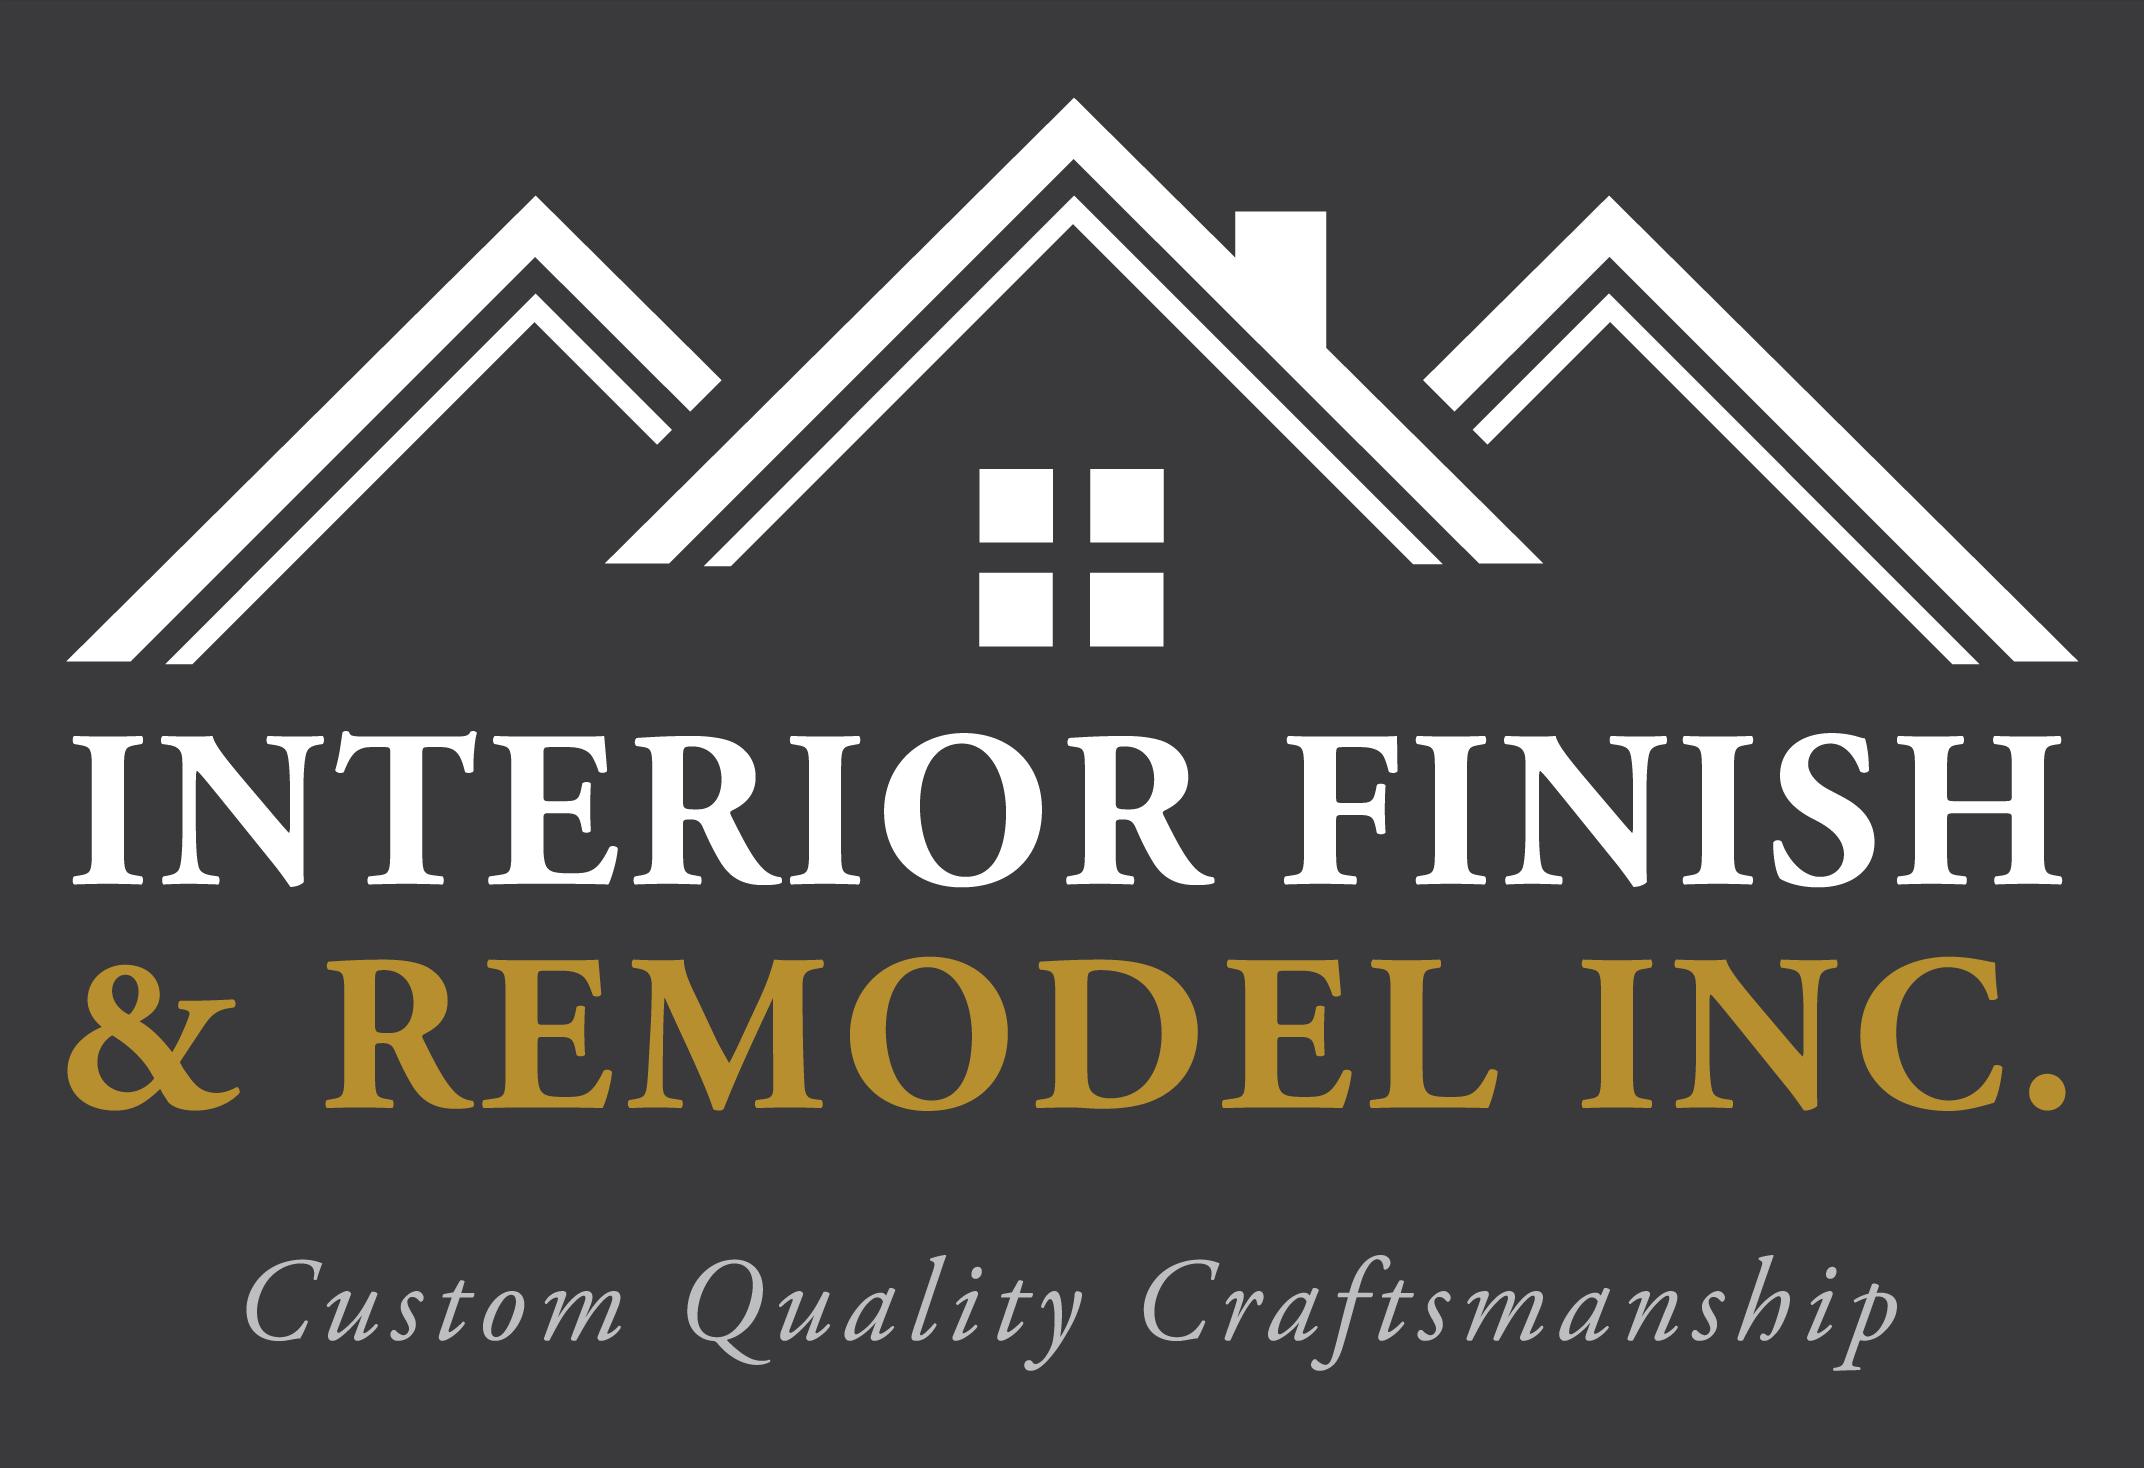 Interior Finish & Remodel PNG 2.4.21